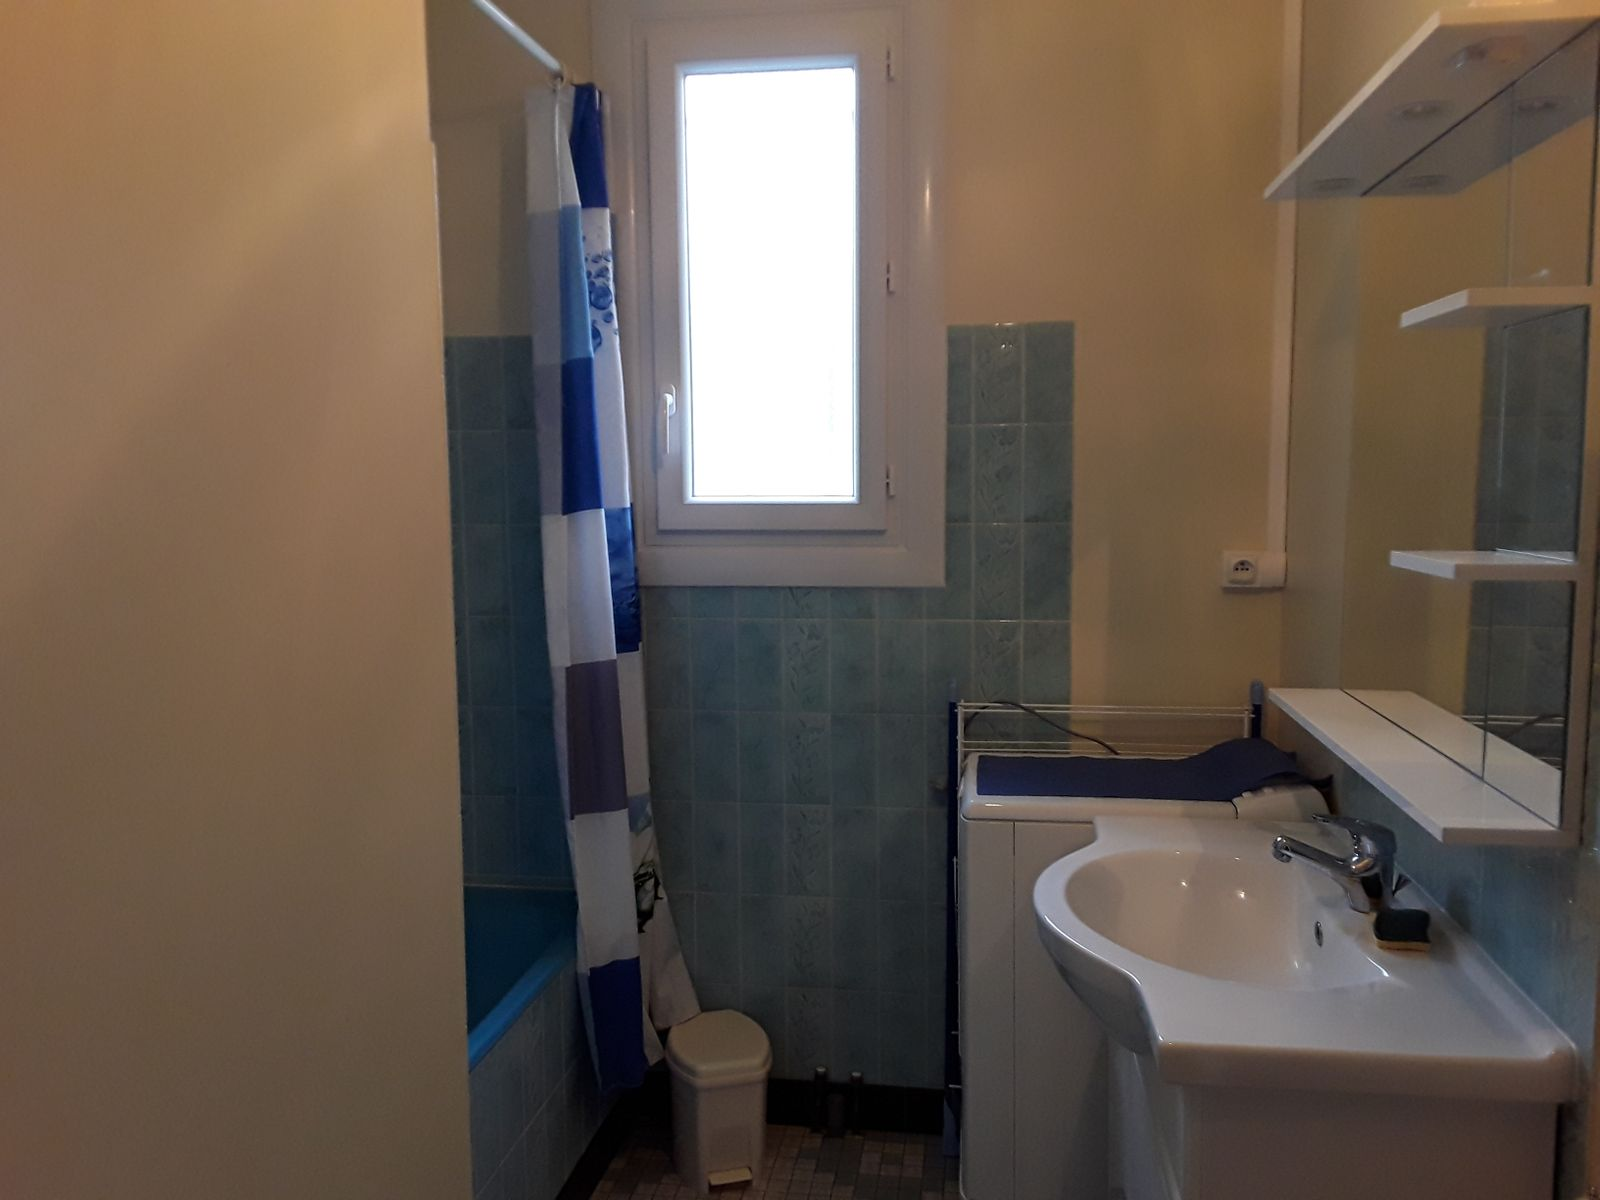 salle de bain avec poignée baignoire